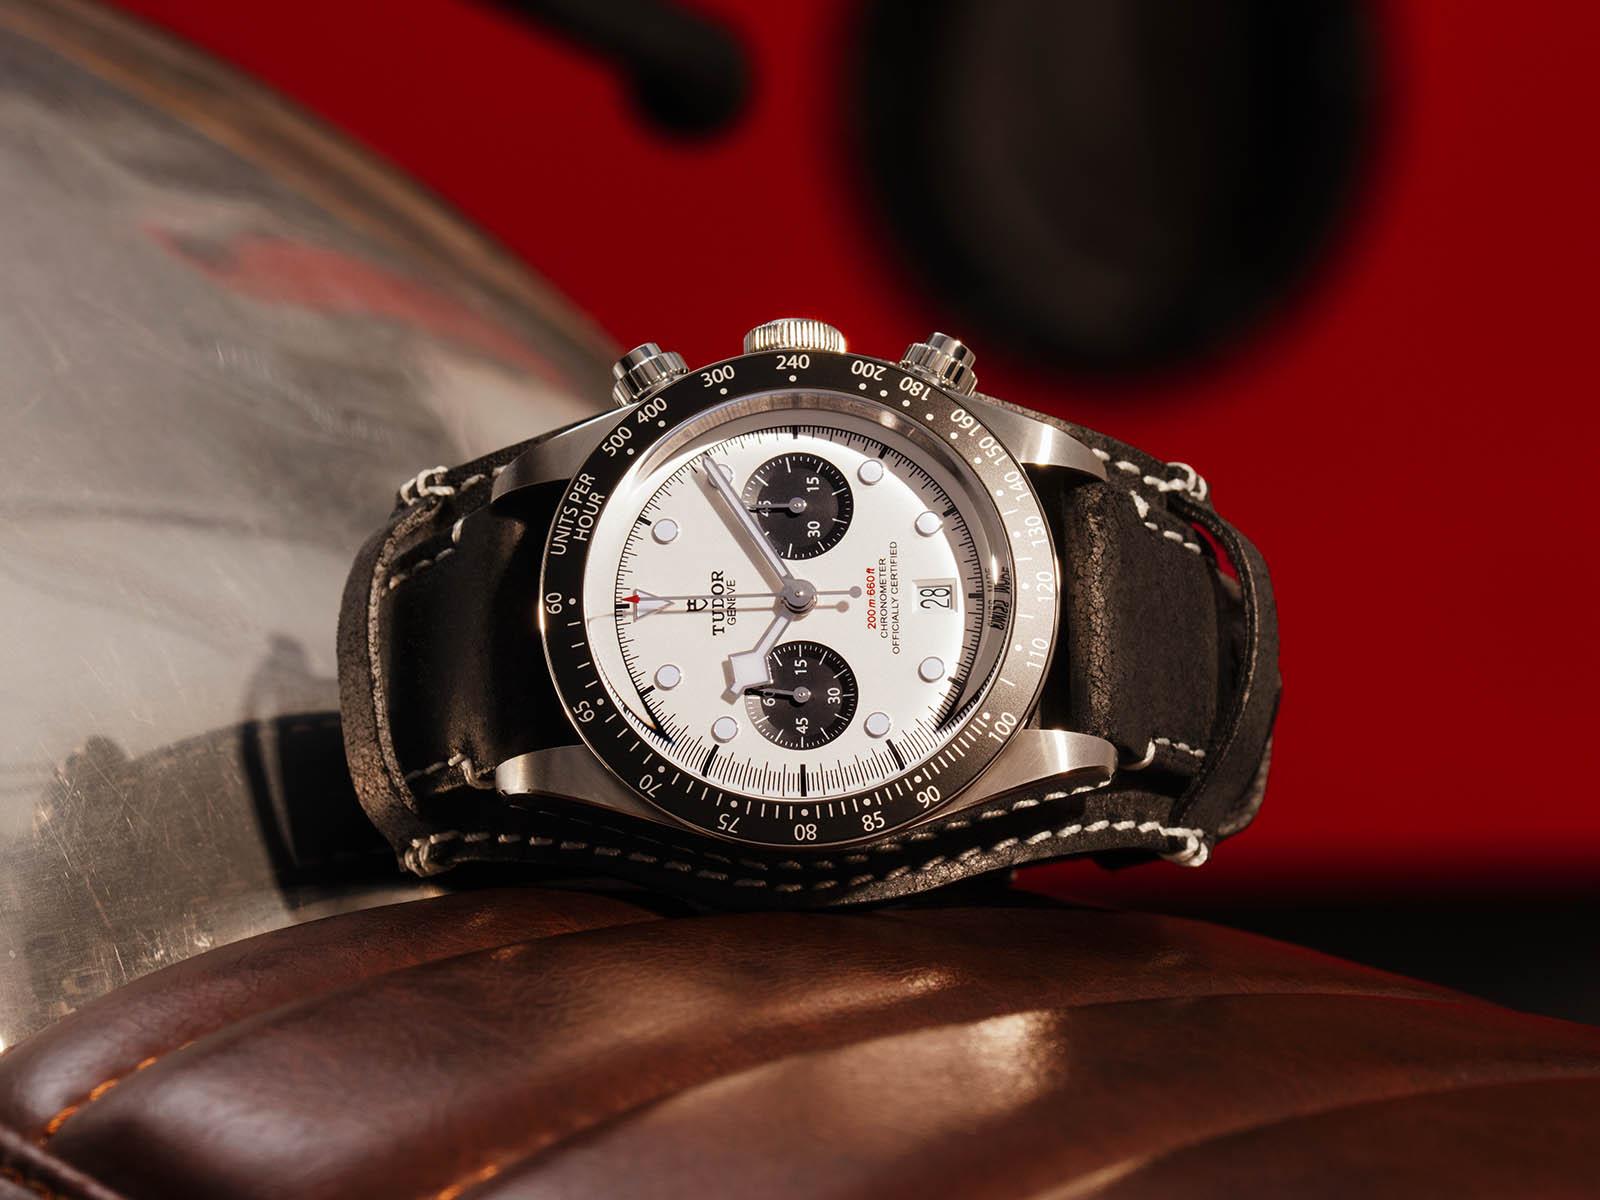 tudor-black-bay-chrono-review-2.jpg